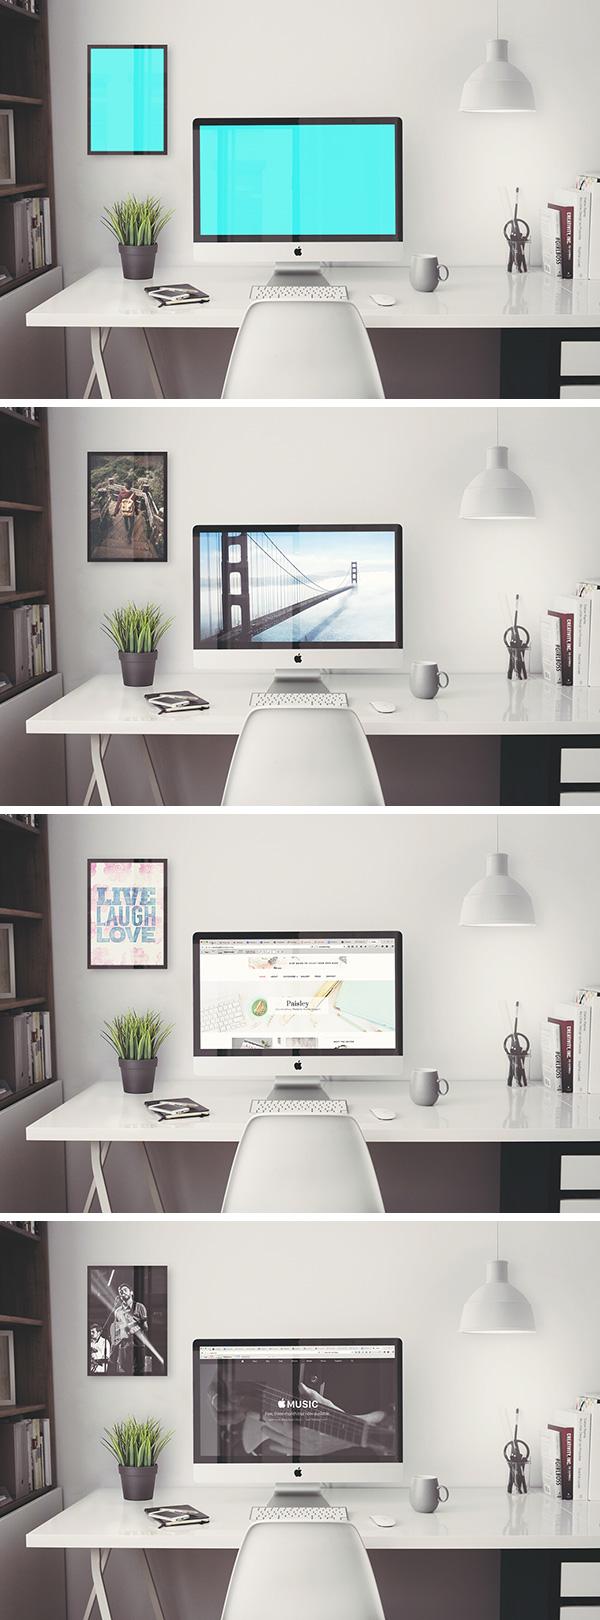 iMac Retina 5k Office MockUp | GraphicBurger